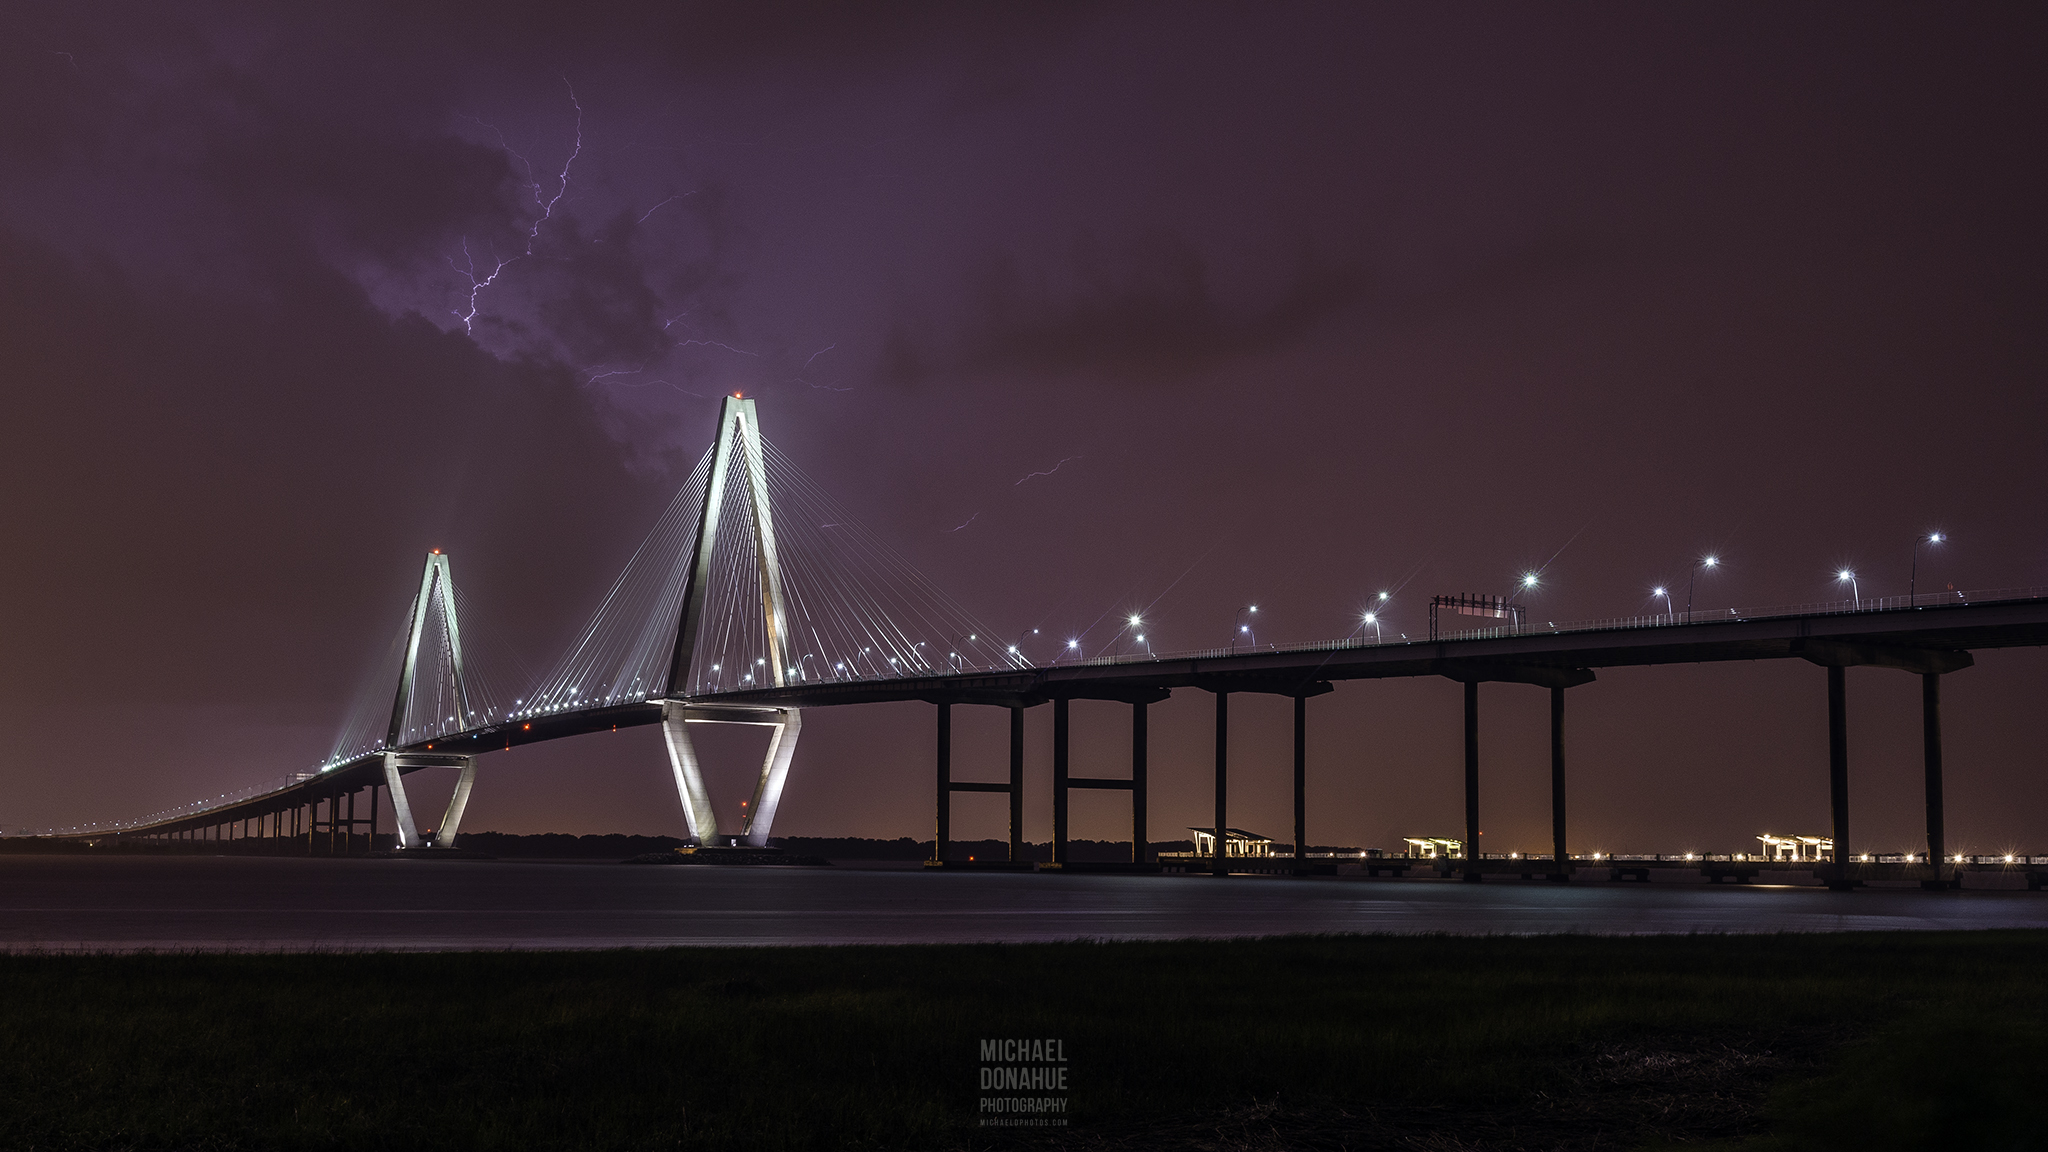 Lightning Over Arthur Ravenel Jr. Bridge by Michael Donahue